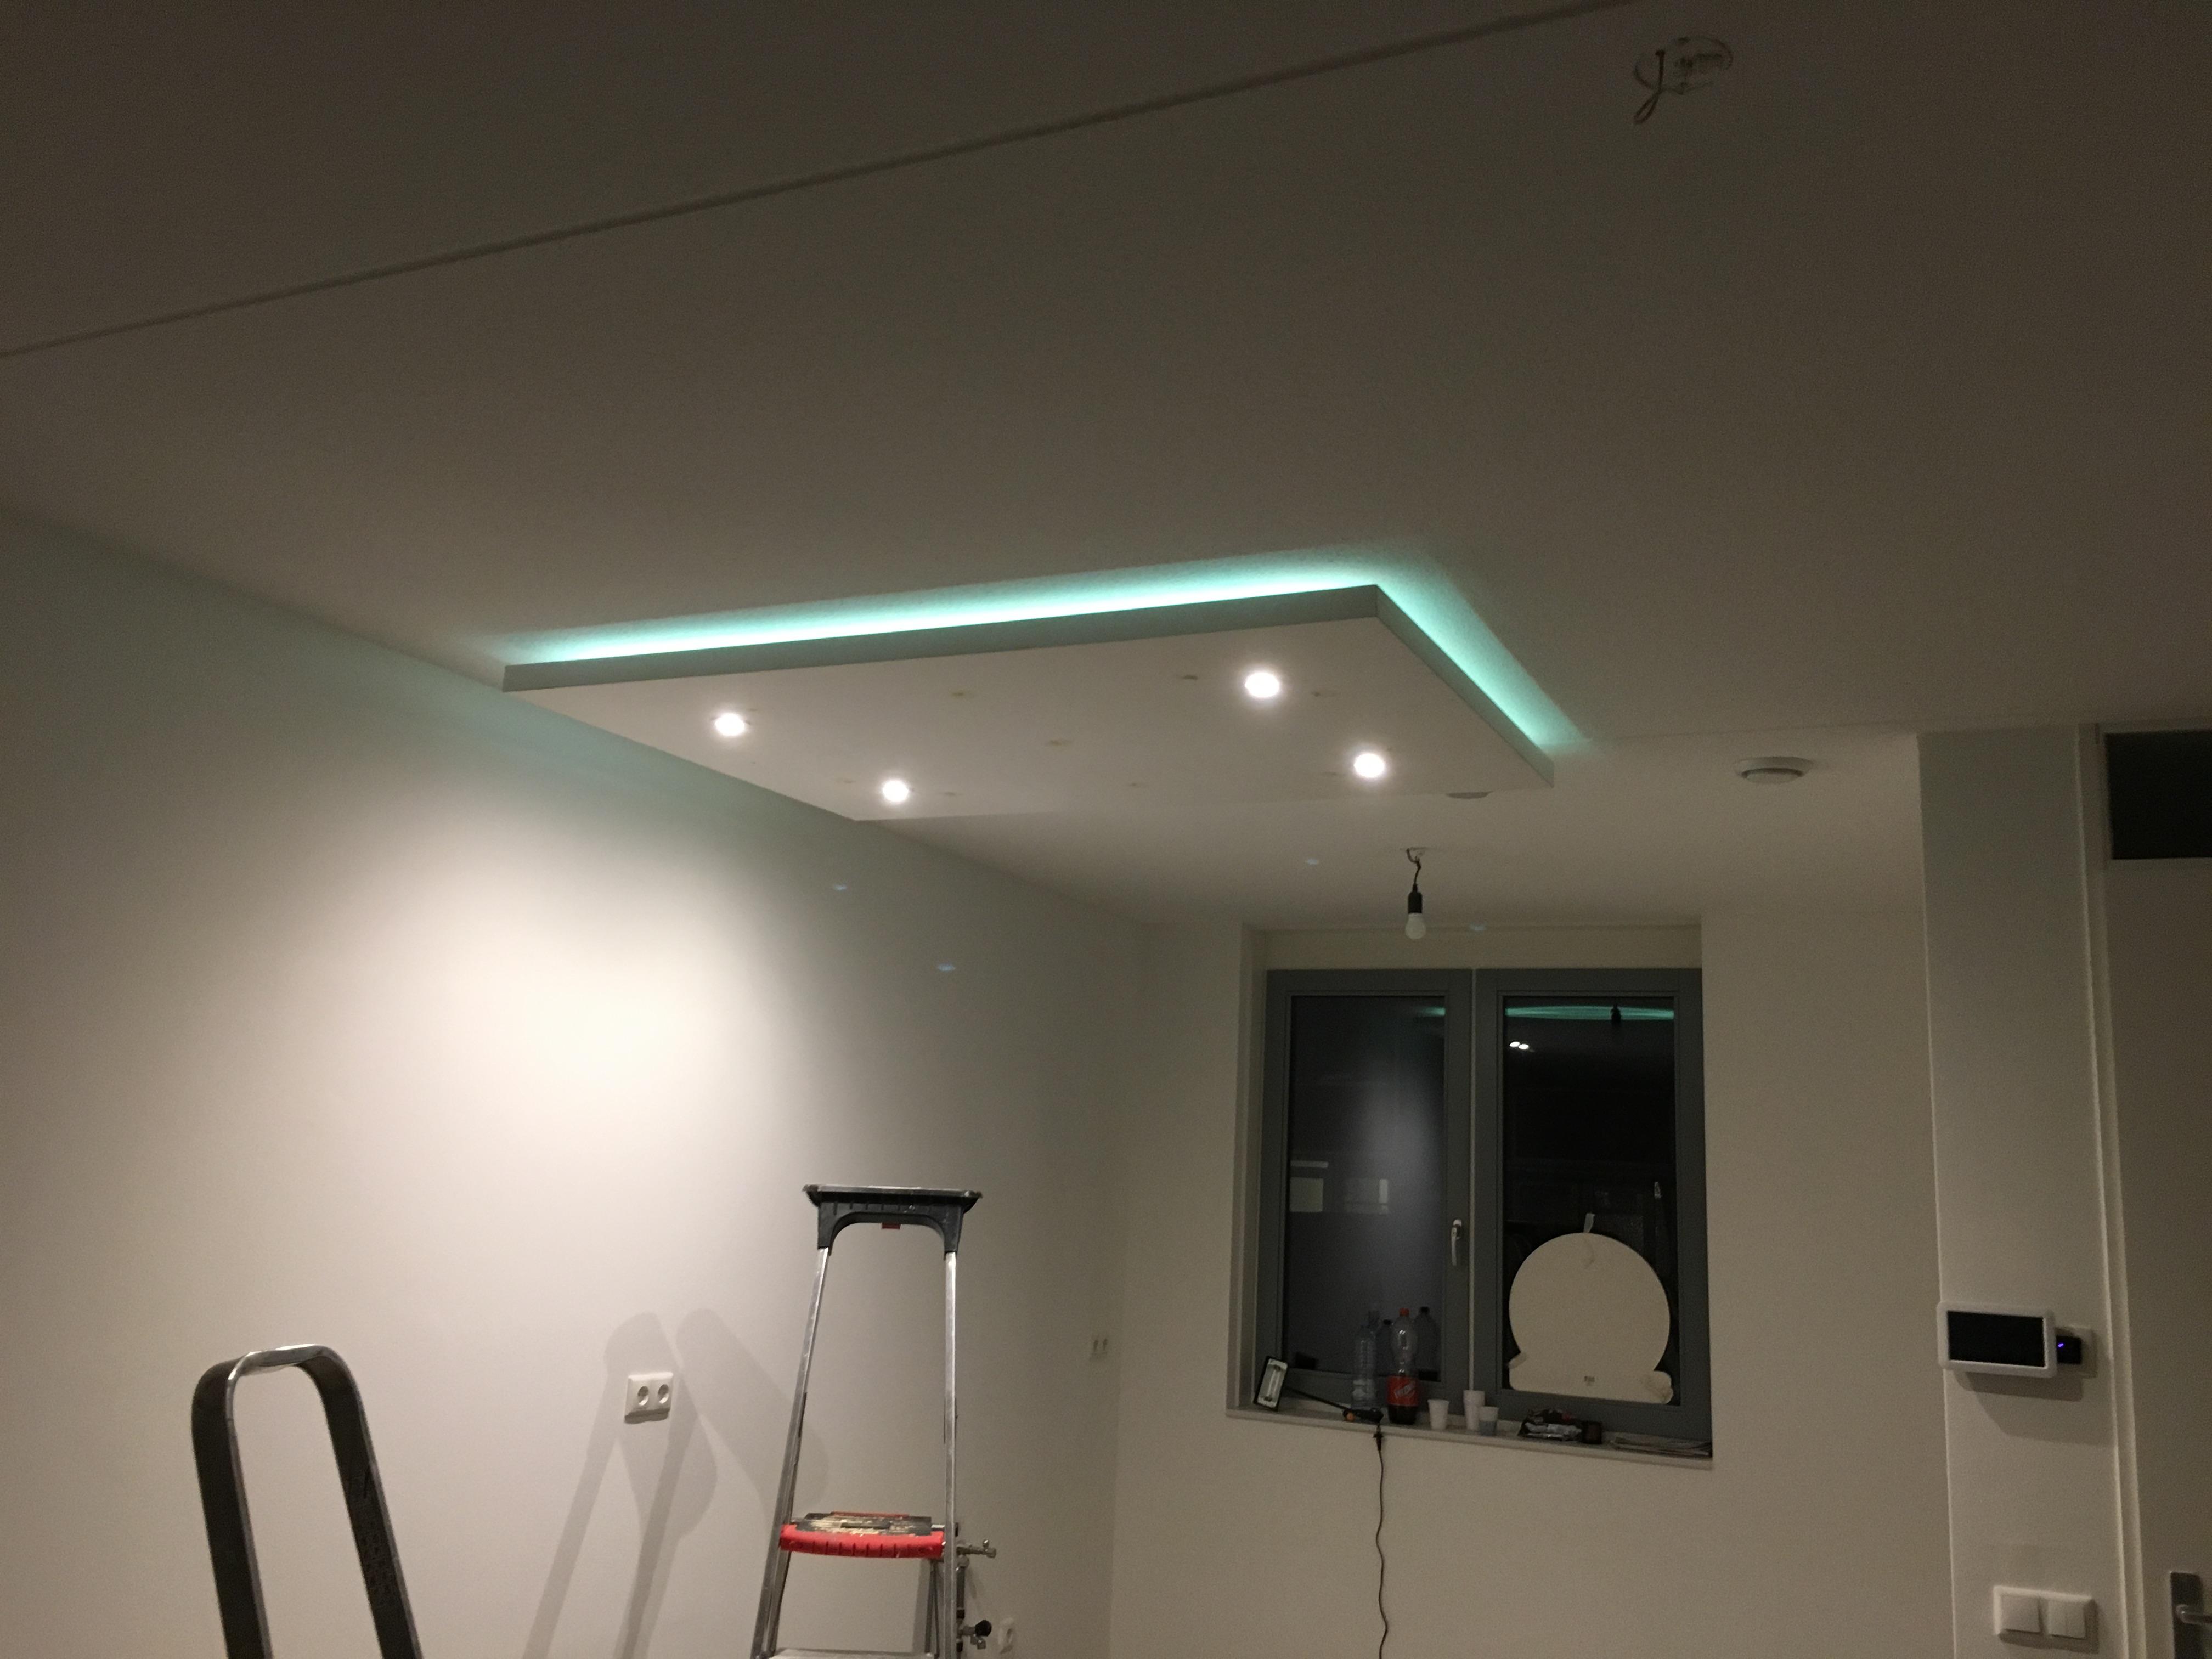 verlaagd plafond met ledverlichting wereldklusser